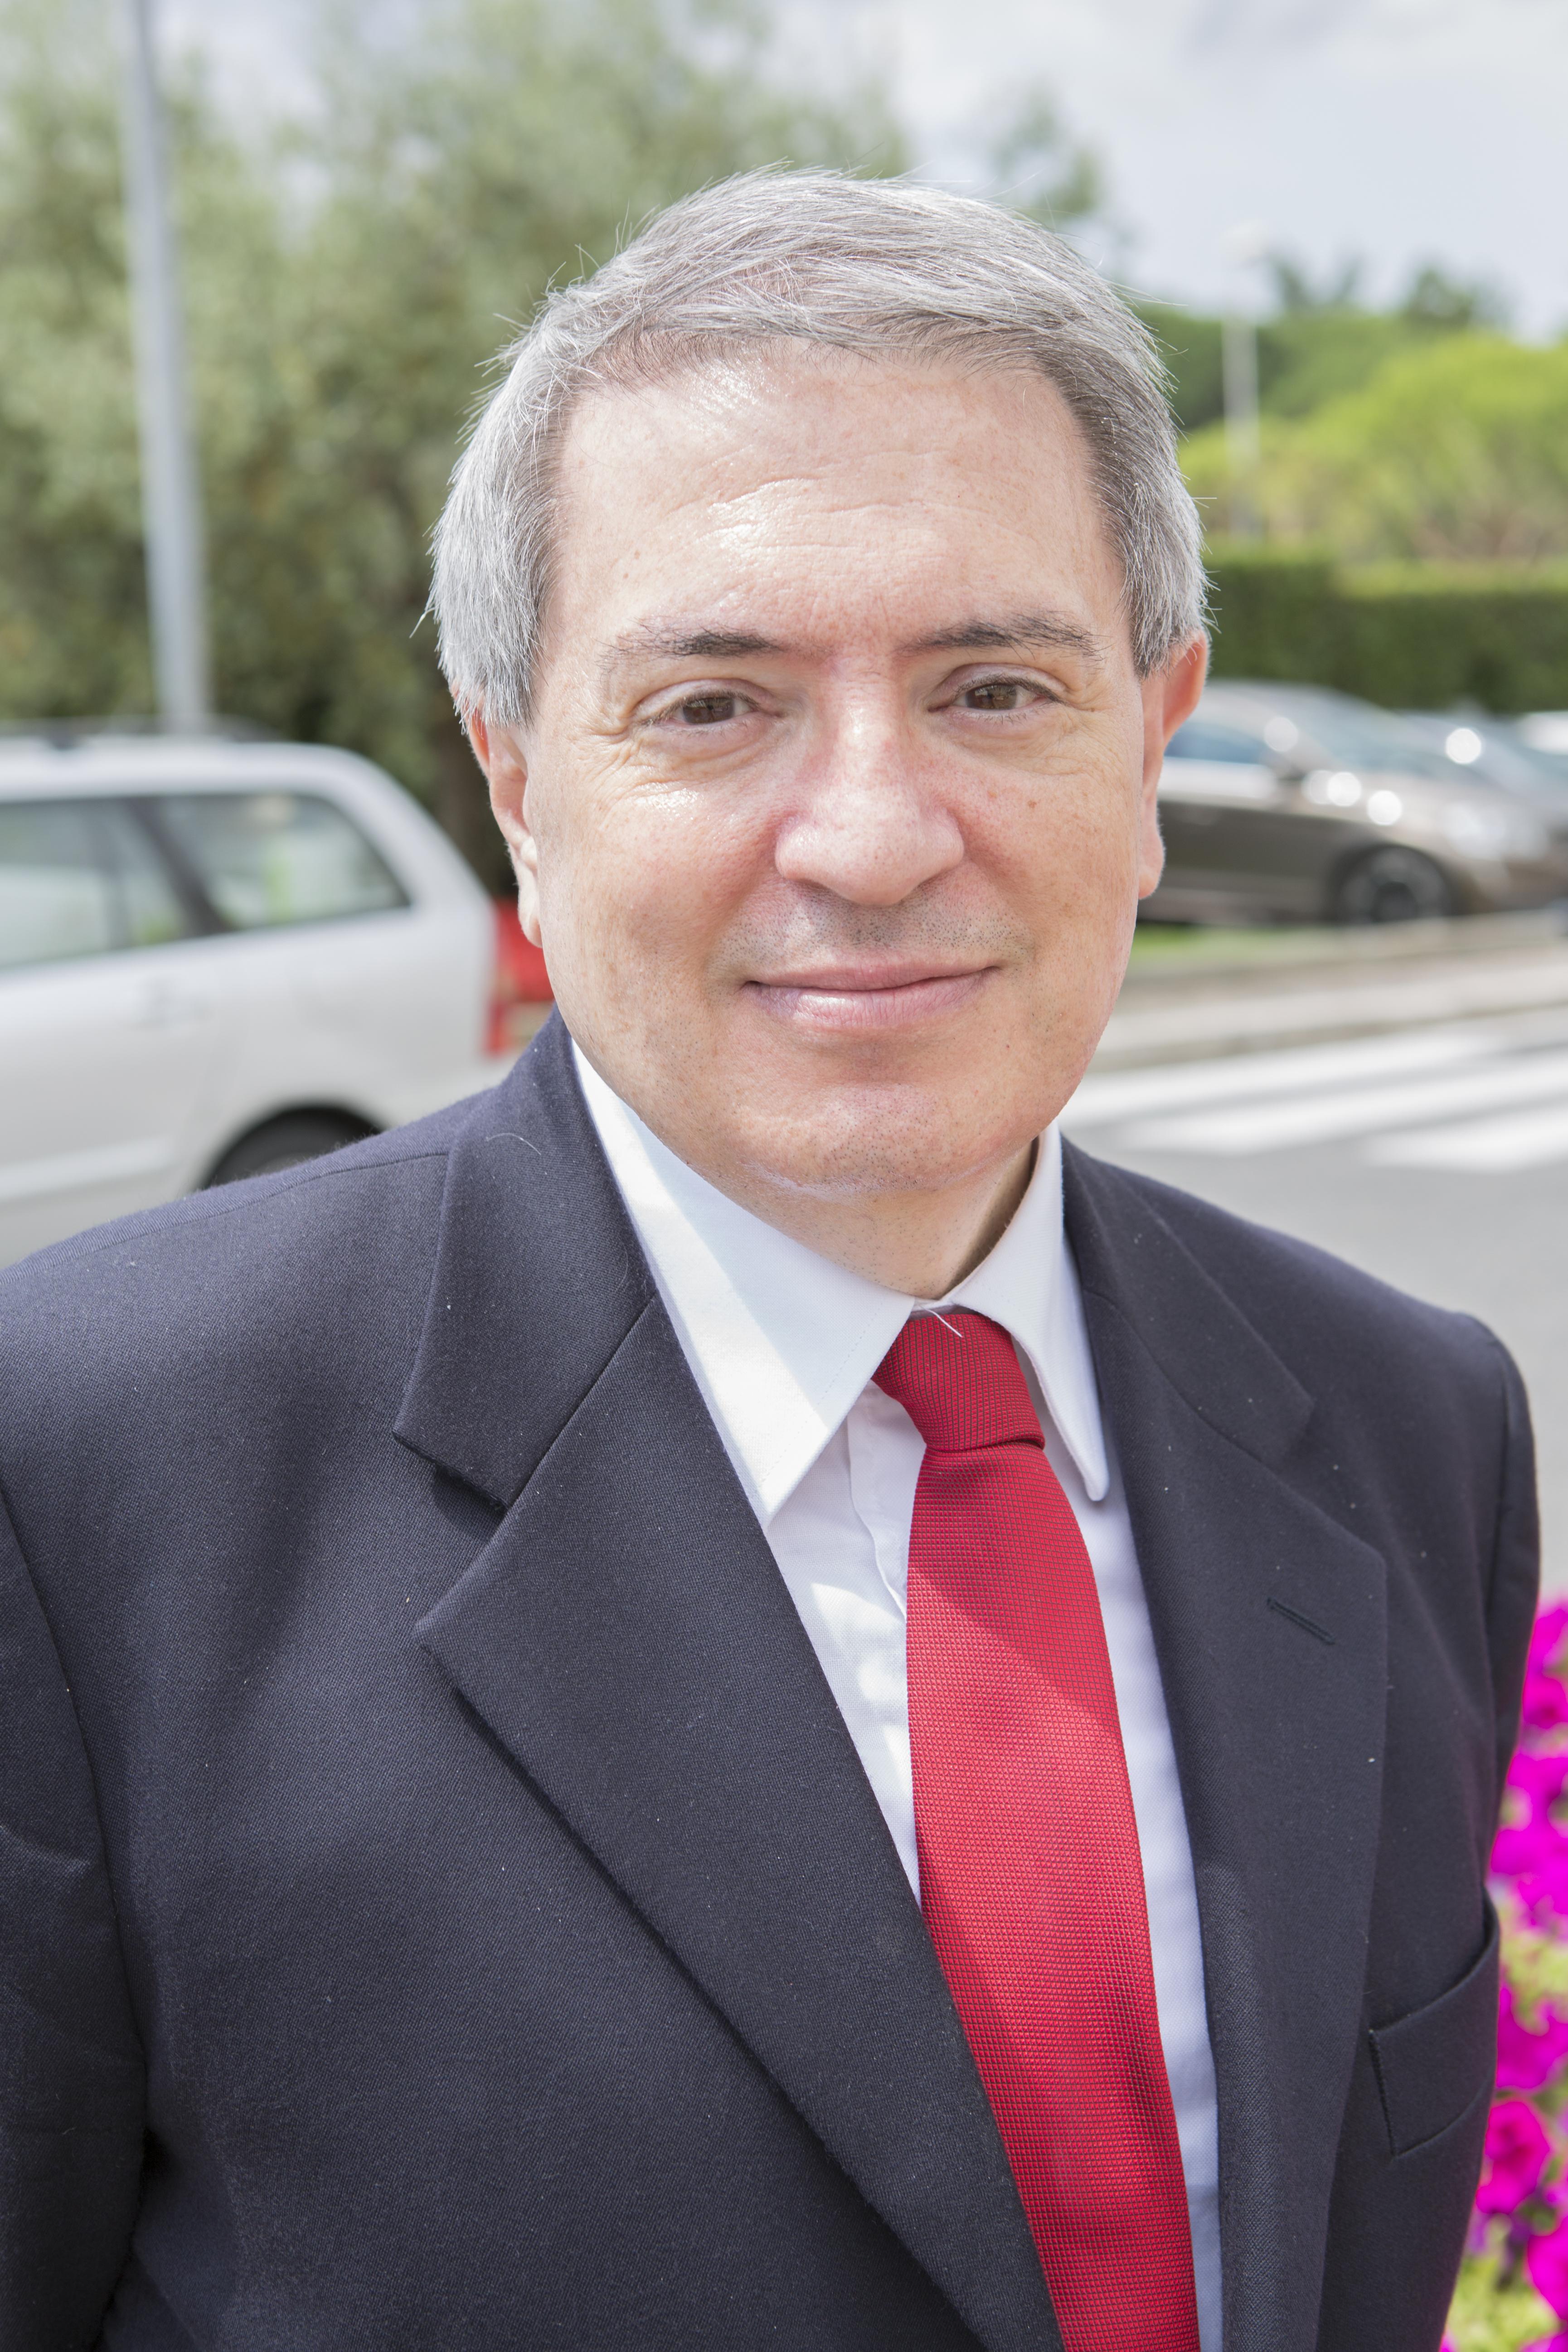 https://upload.wikimedia.org/wikipedia/it/3/3e/Pierluigi_Guiducci.jpg